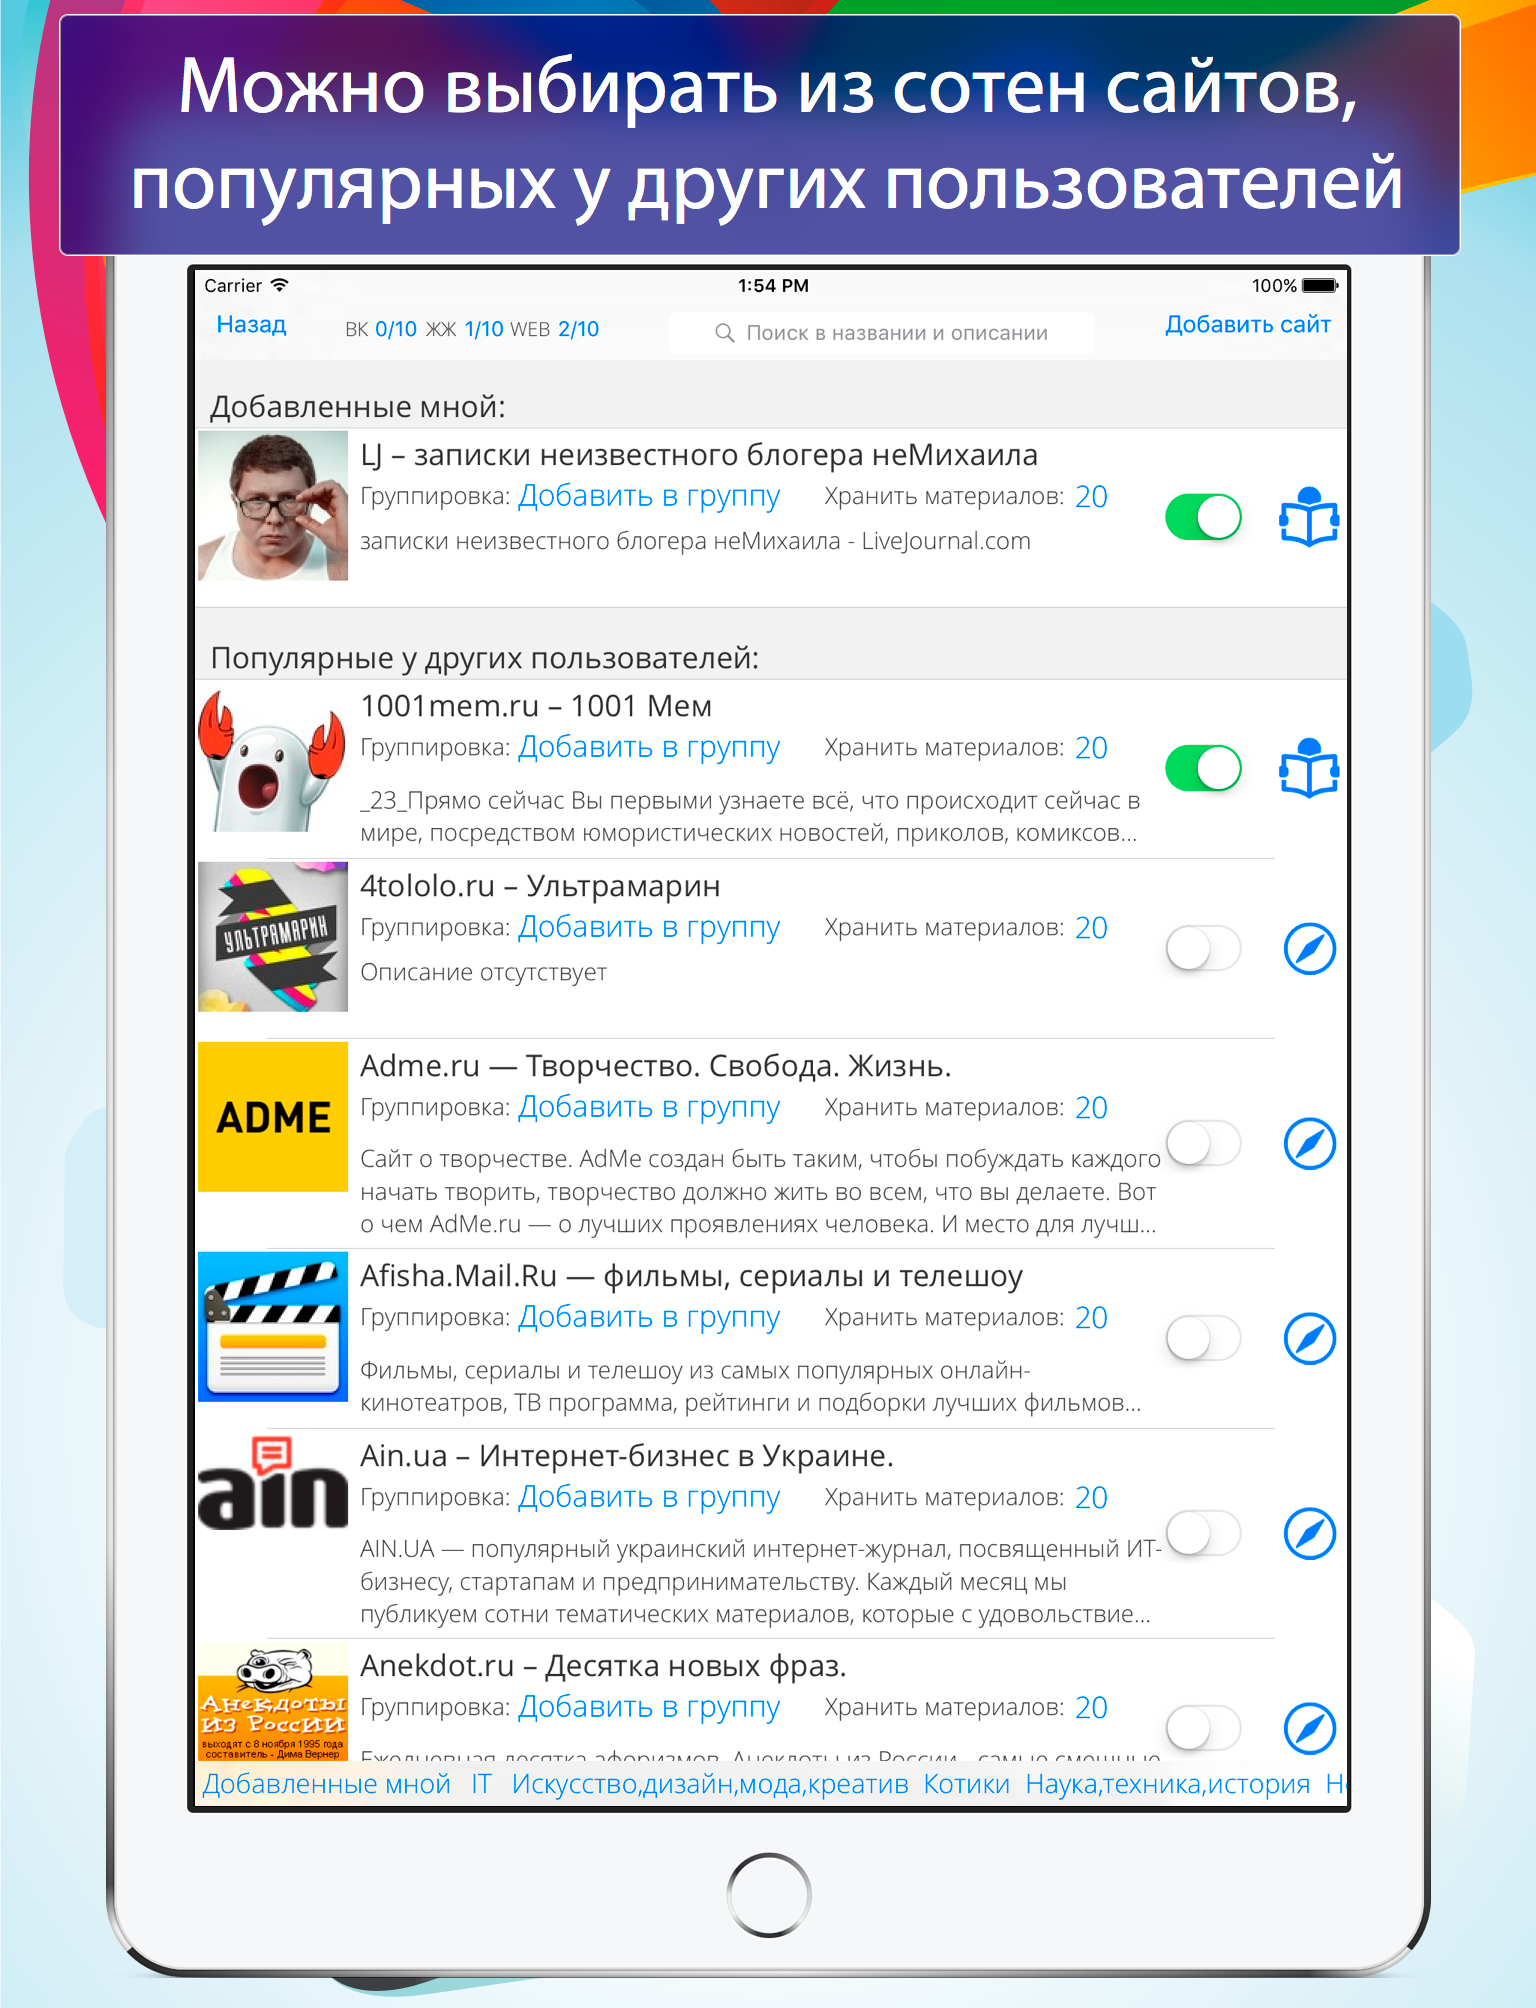 Офлайн-браузер Мегалента показал альтернативу традиционному вебvсёрфингу